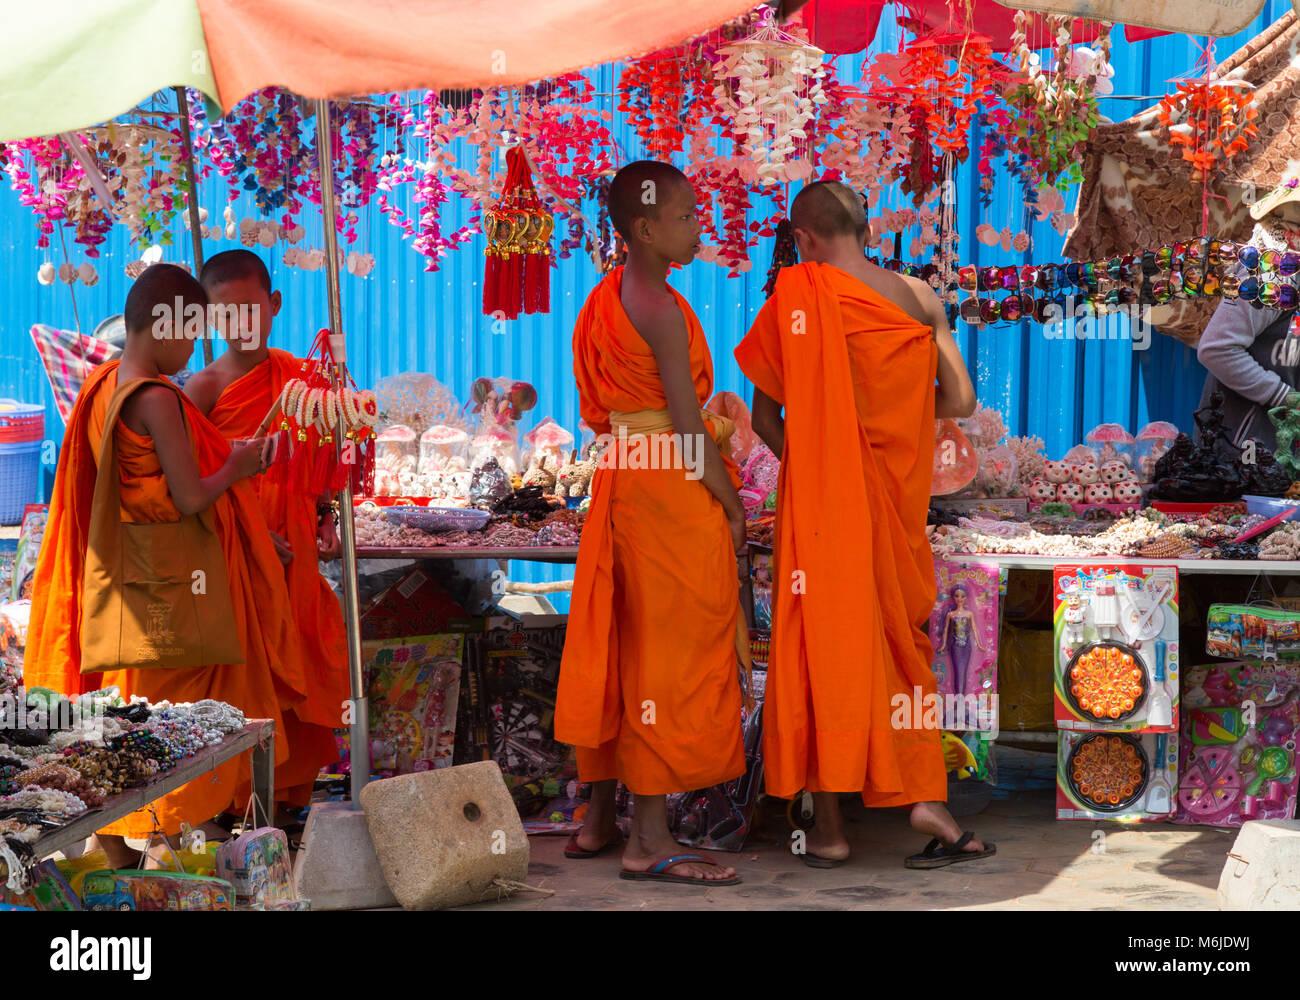 Les jeunes moines bouddhistes shopping at a market stall, Kep, au Cambodge, en Asie Photo Stock